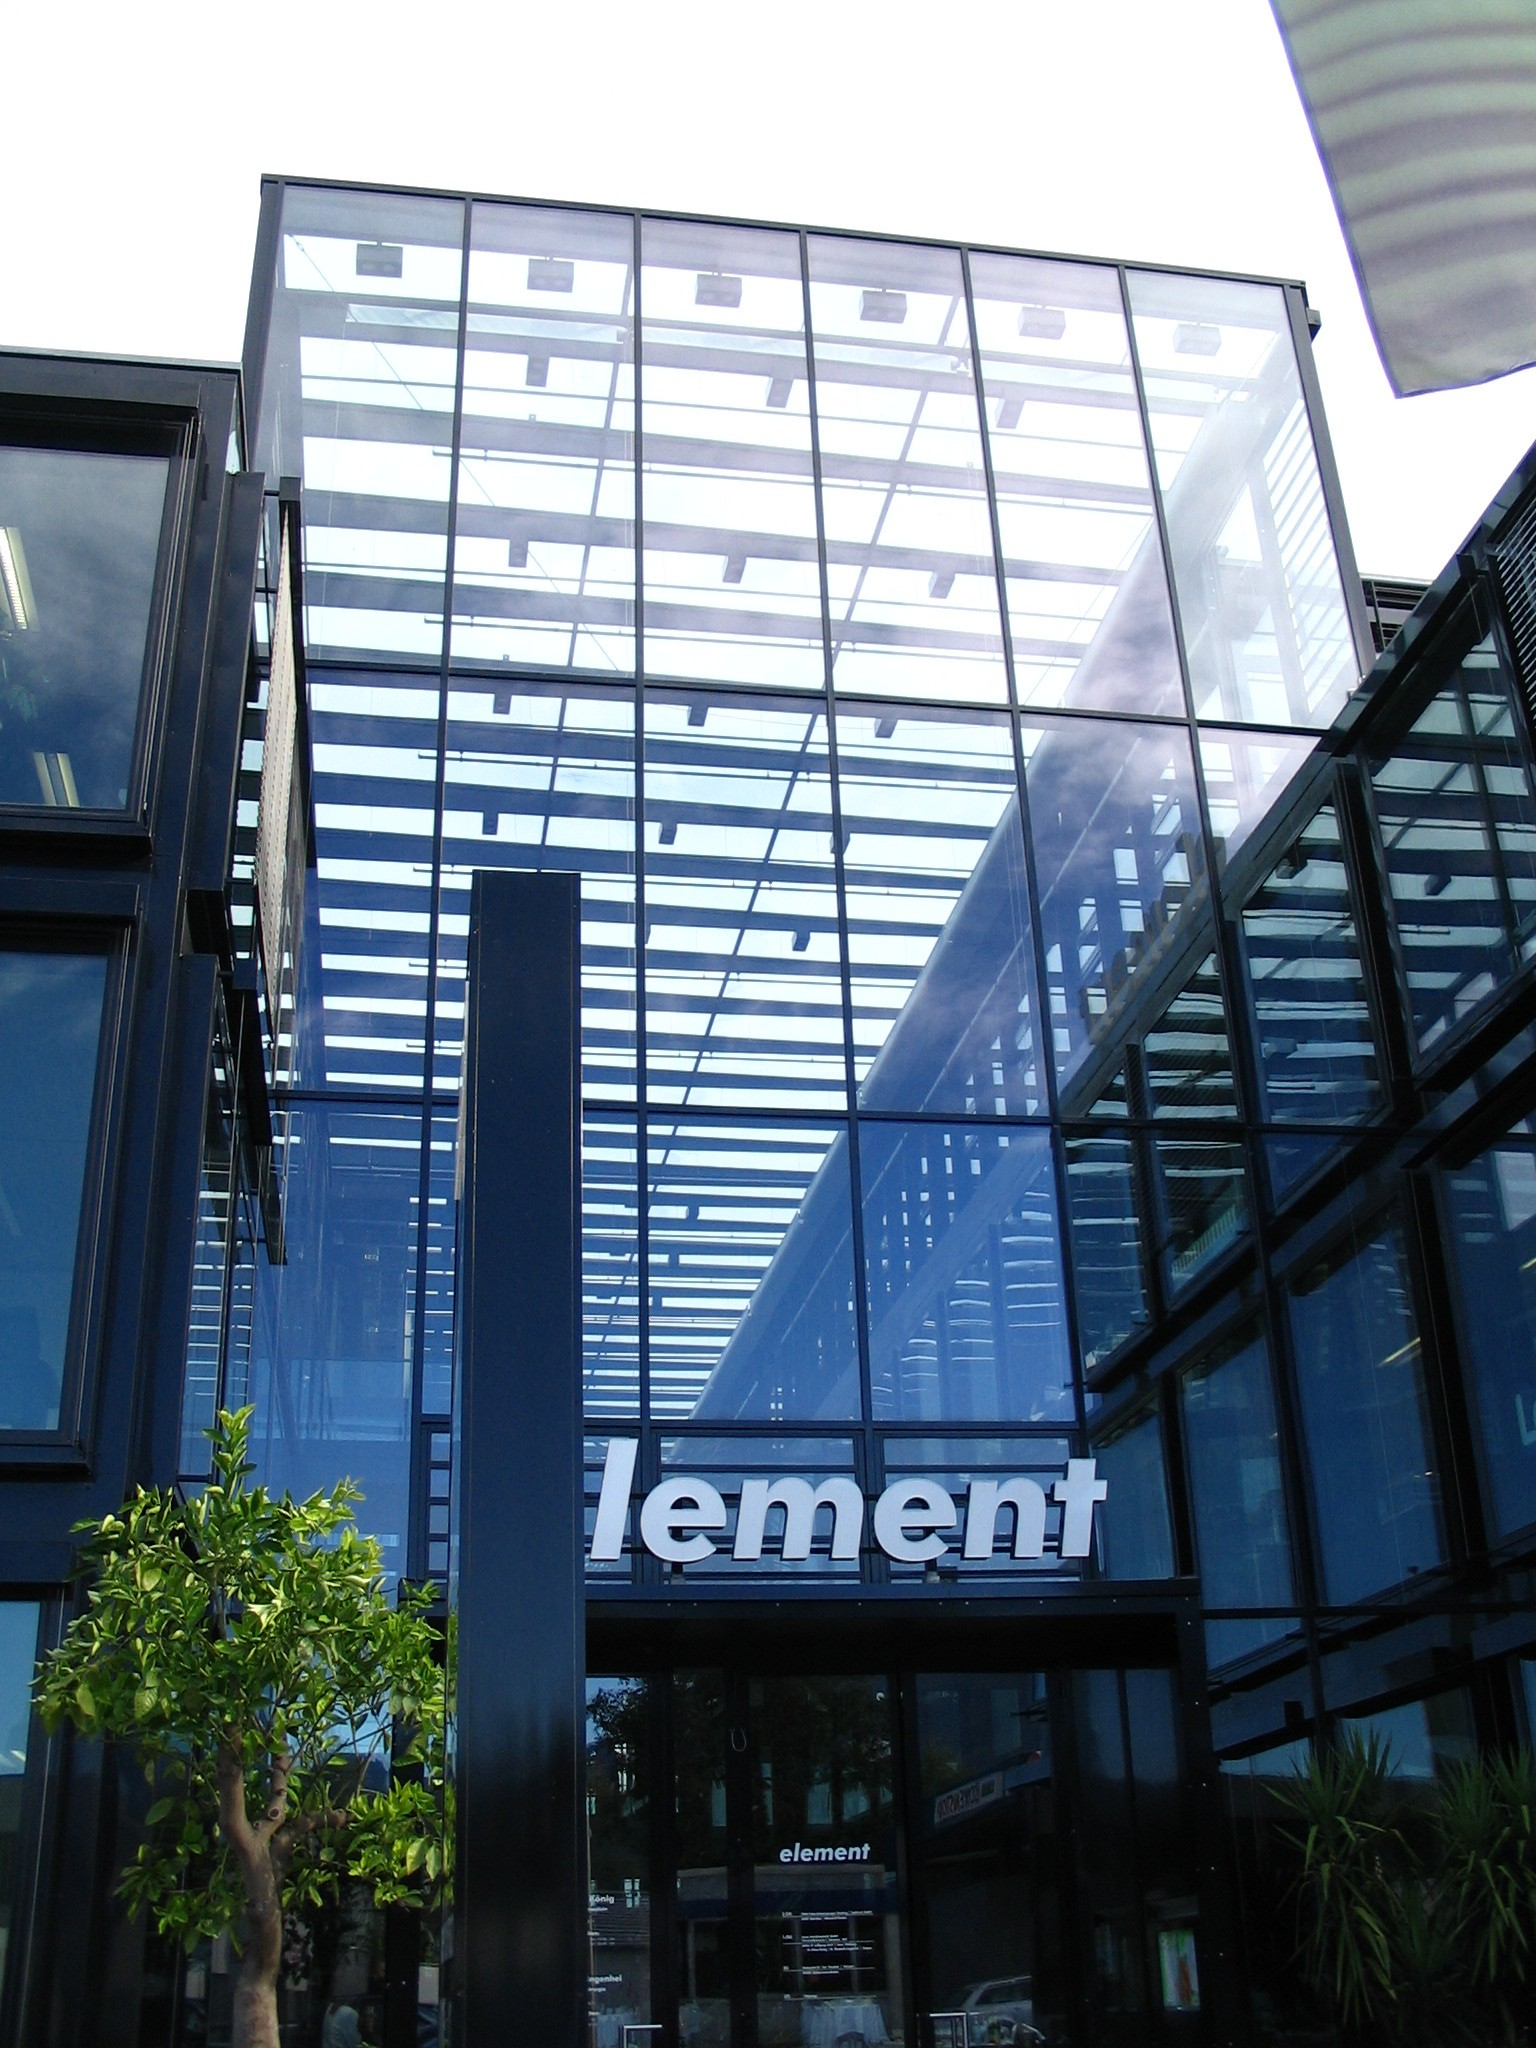 ENERCRET-element - Dornbirn